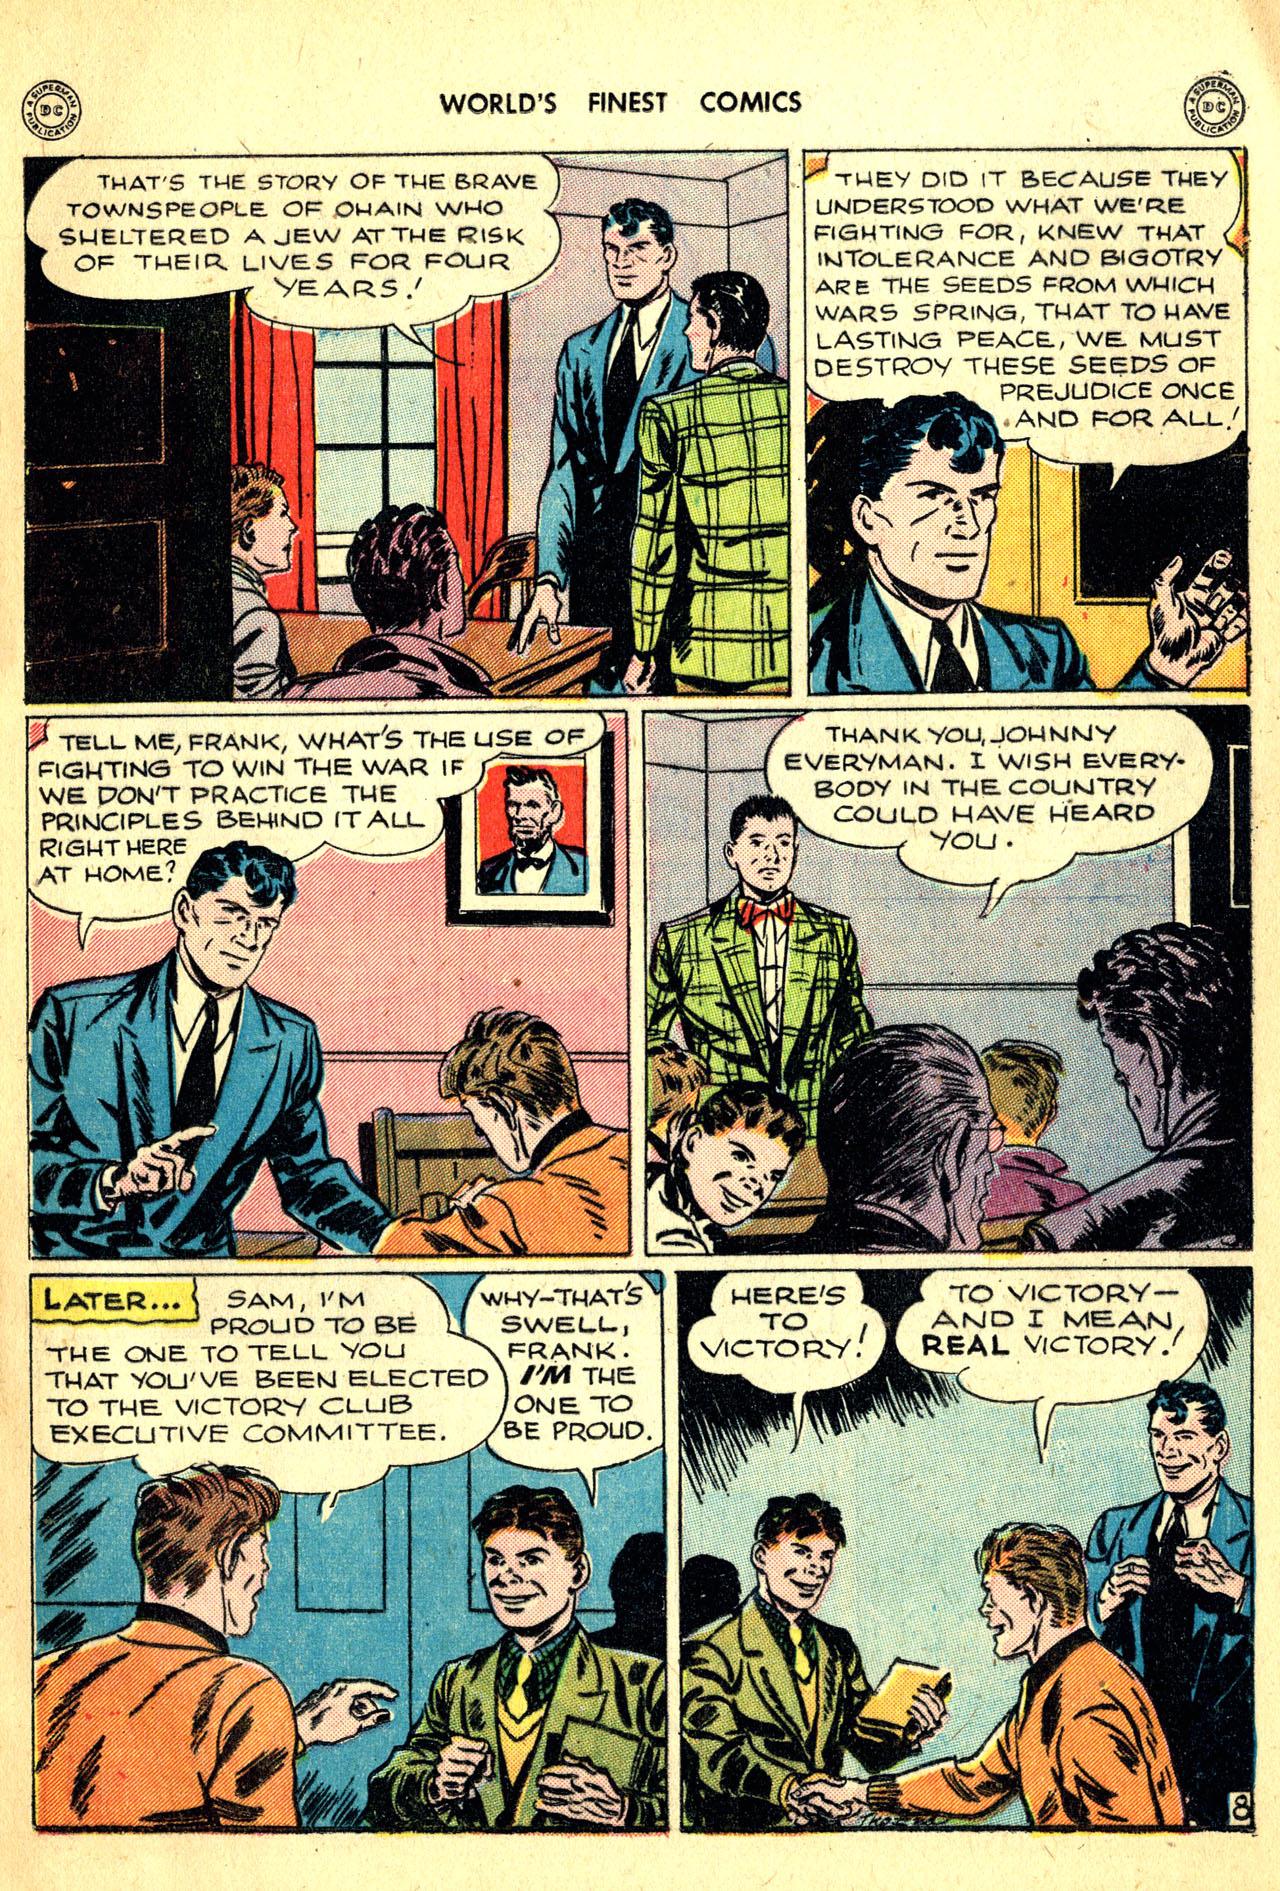 Read online World's Finest Comics comic -  Issue #18 - 67